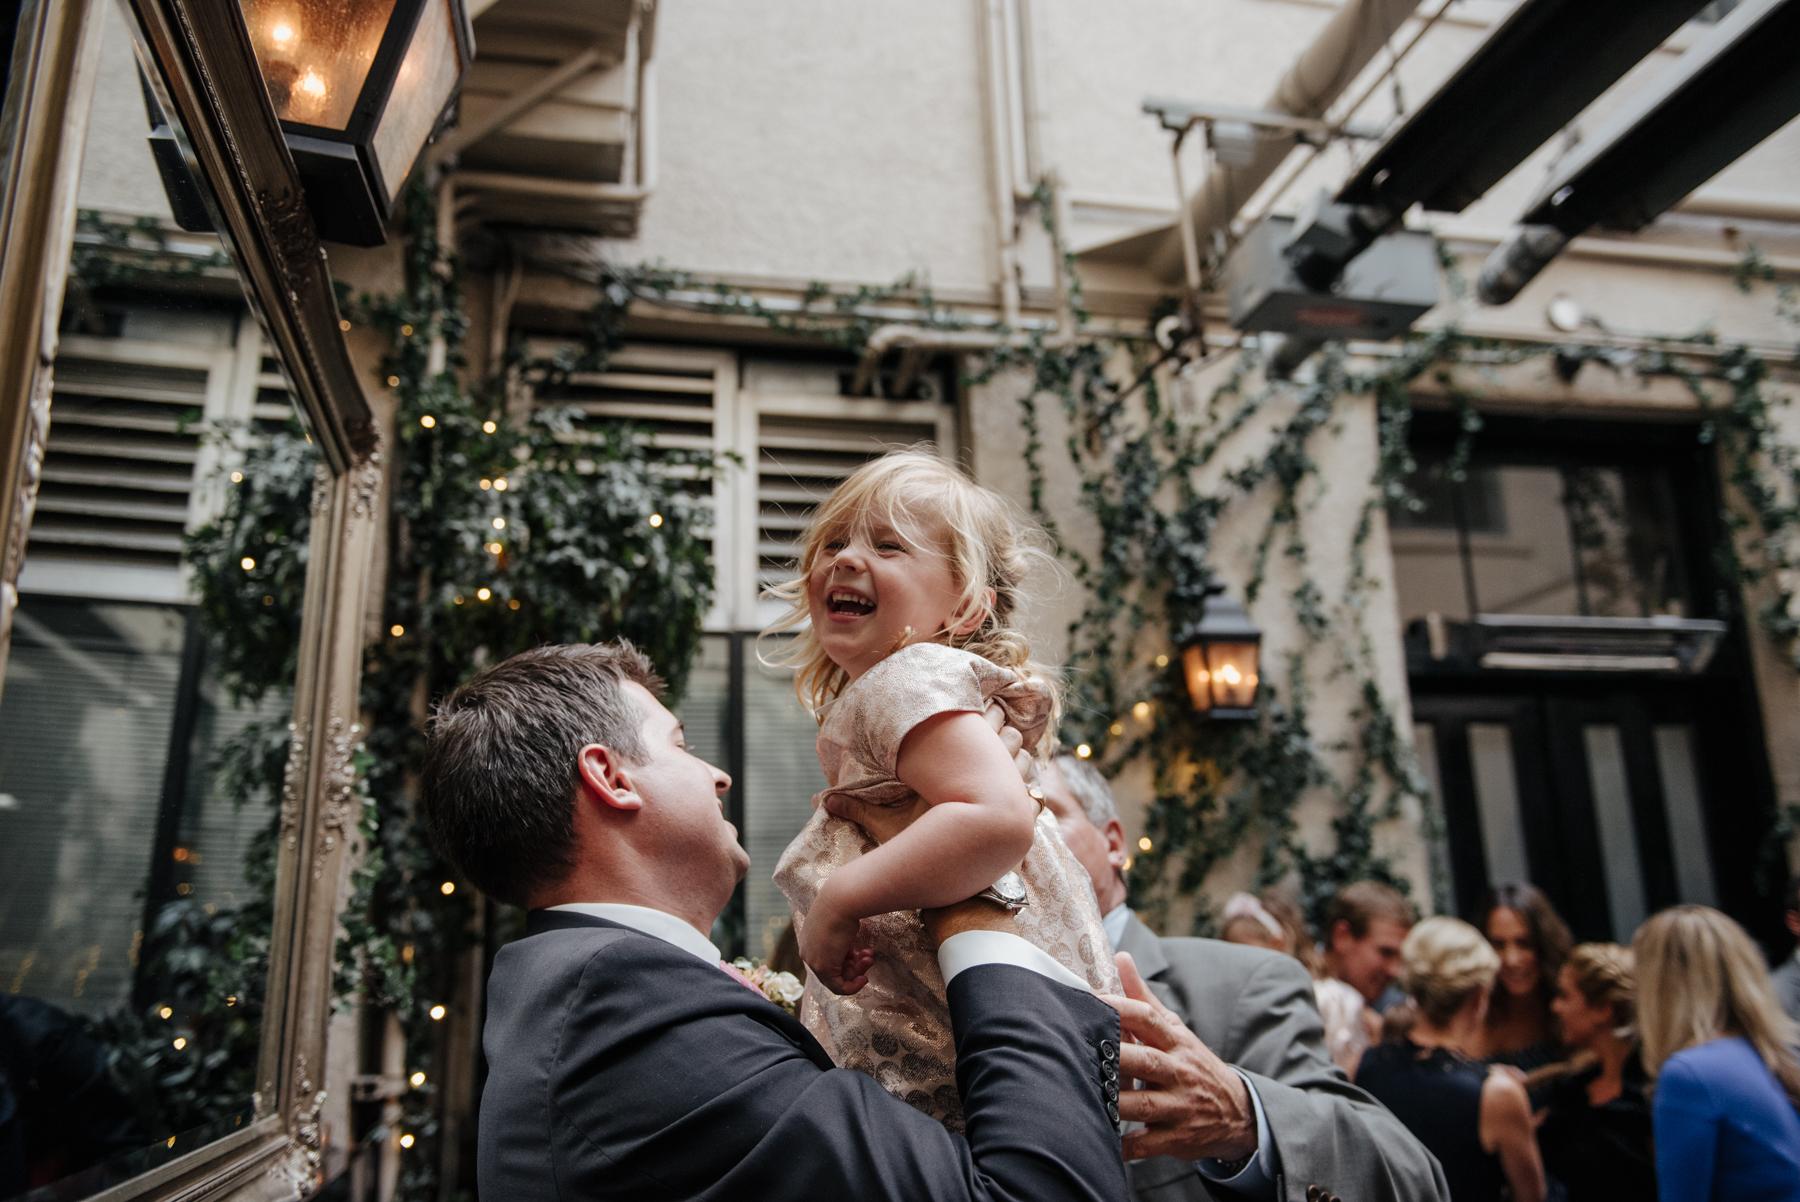 kaoverii_silva_photographer_cynthia_richard_wedding_vancouver_brix_&_mortar-22.jpg